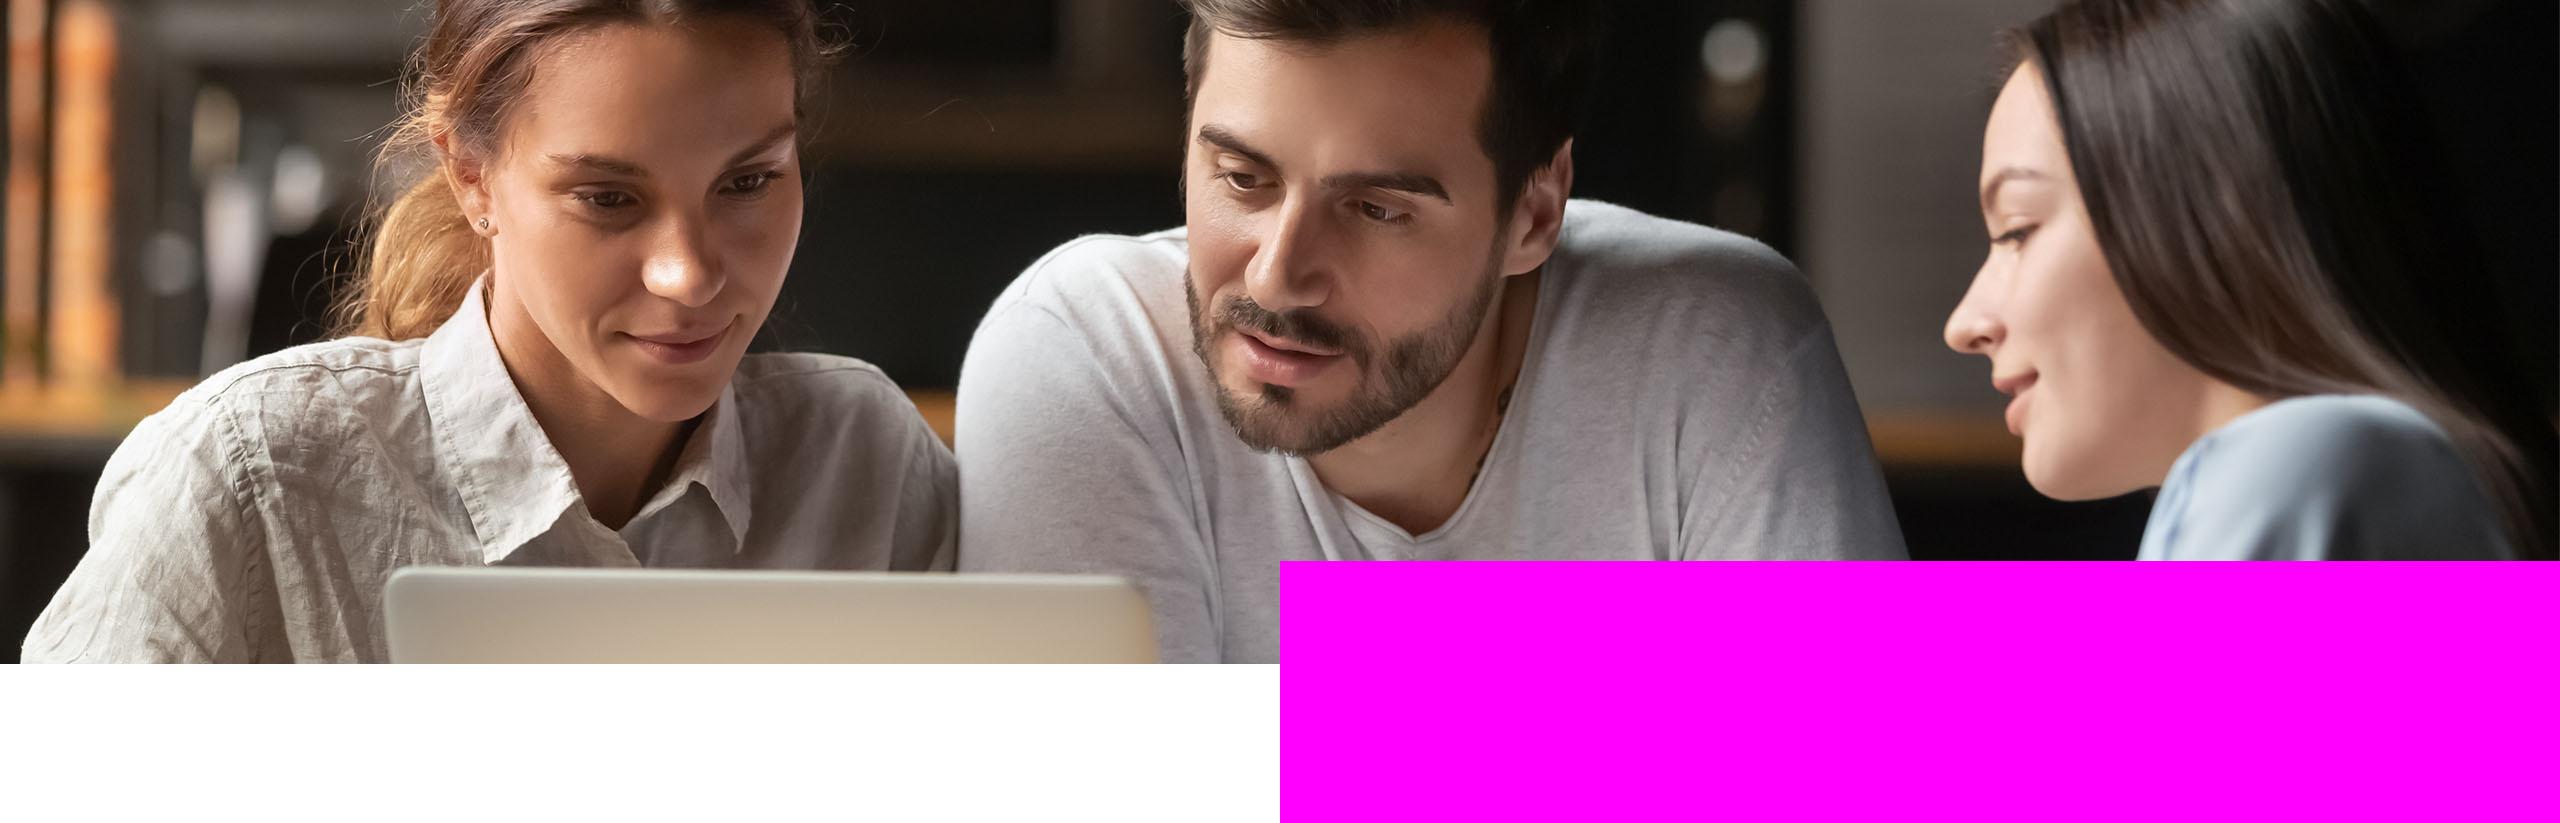 header-bild-digitalisierung-beratung-prozess-software-digitale-beratung-bridge-its-gmbh